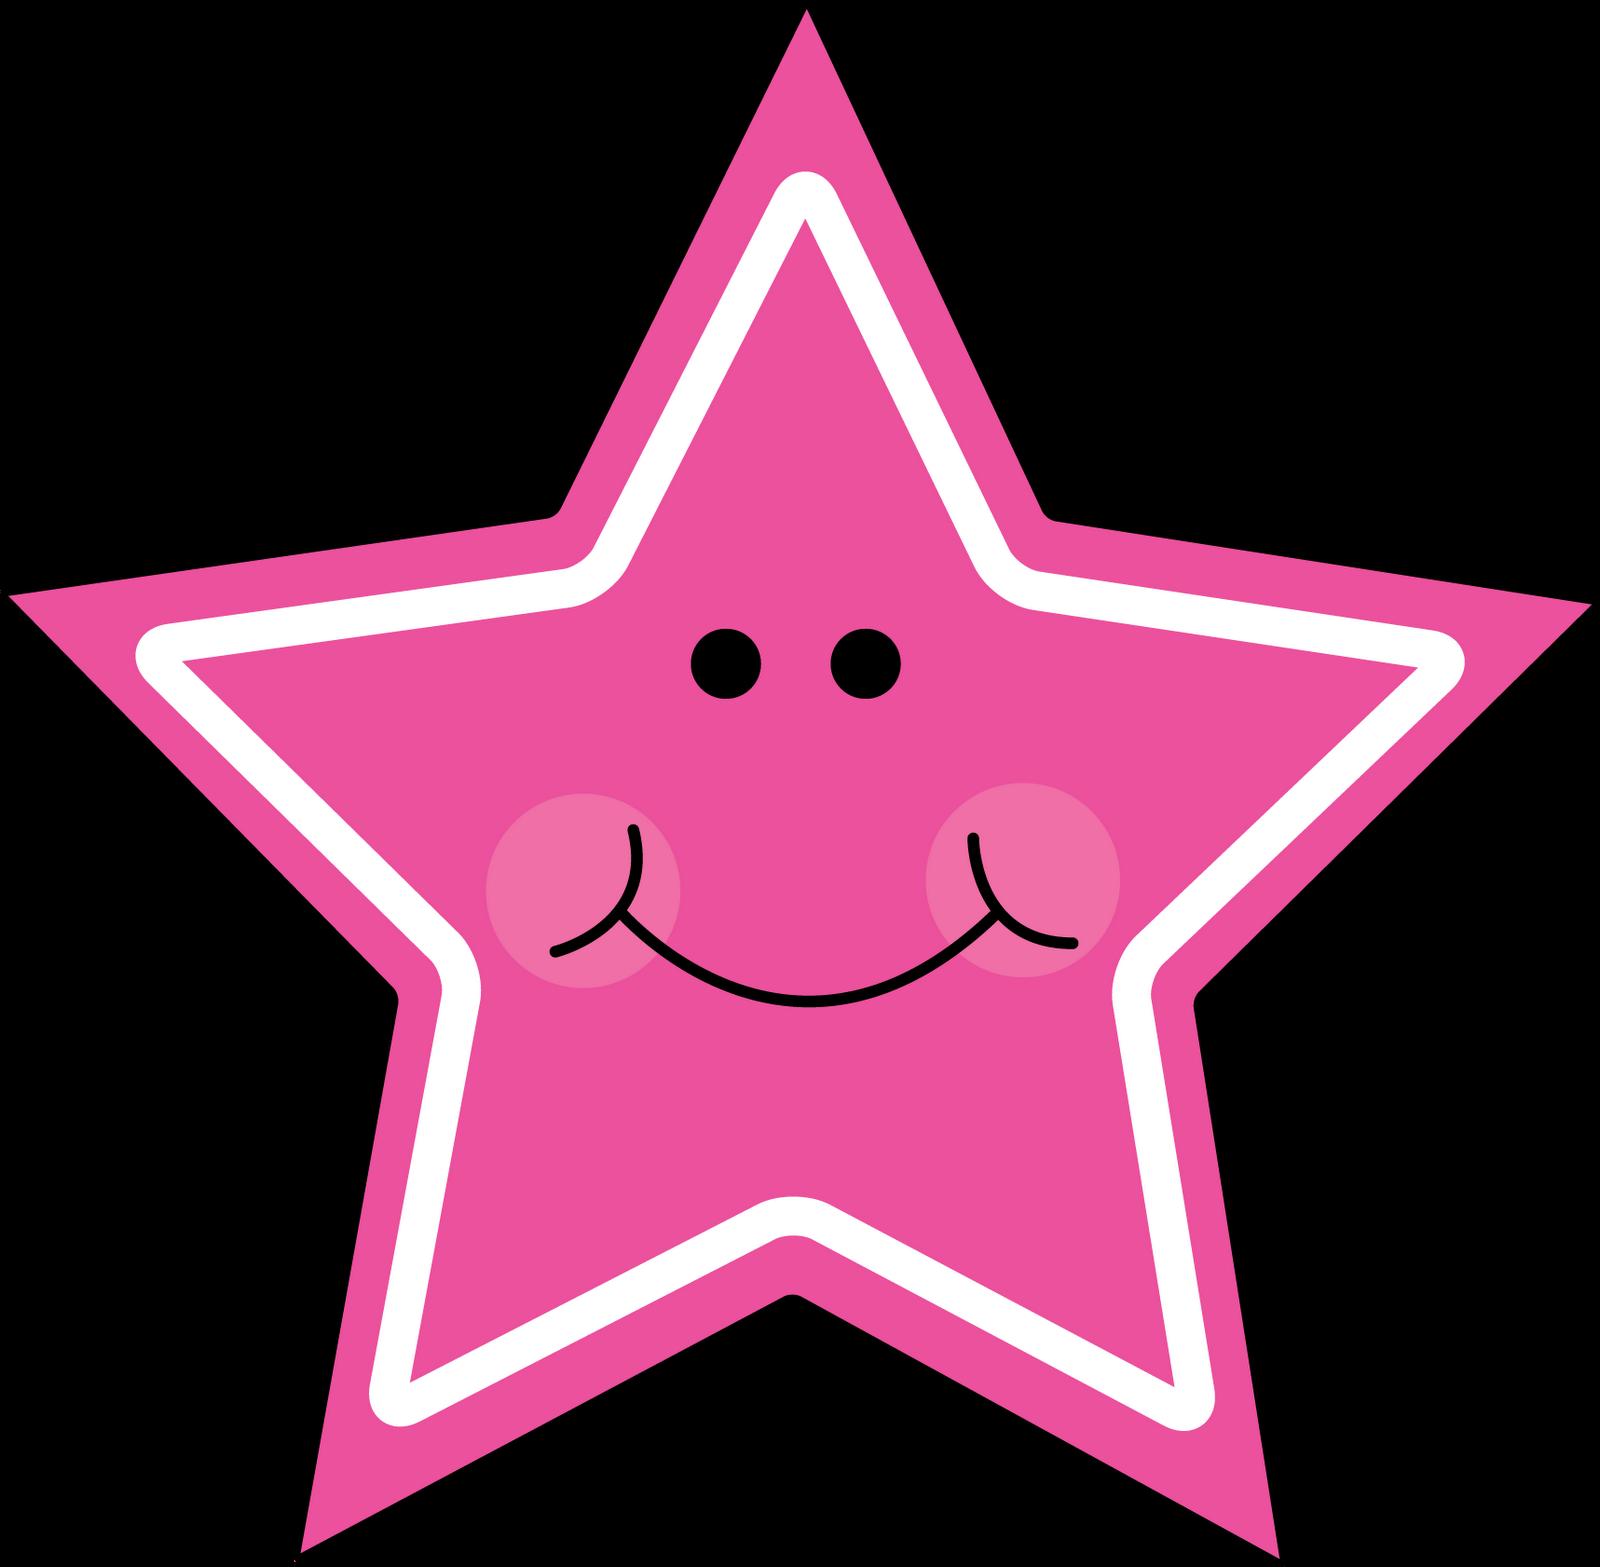 1600x1567 Pink Stars Clipart Star Clip Art Image Present